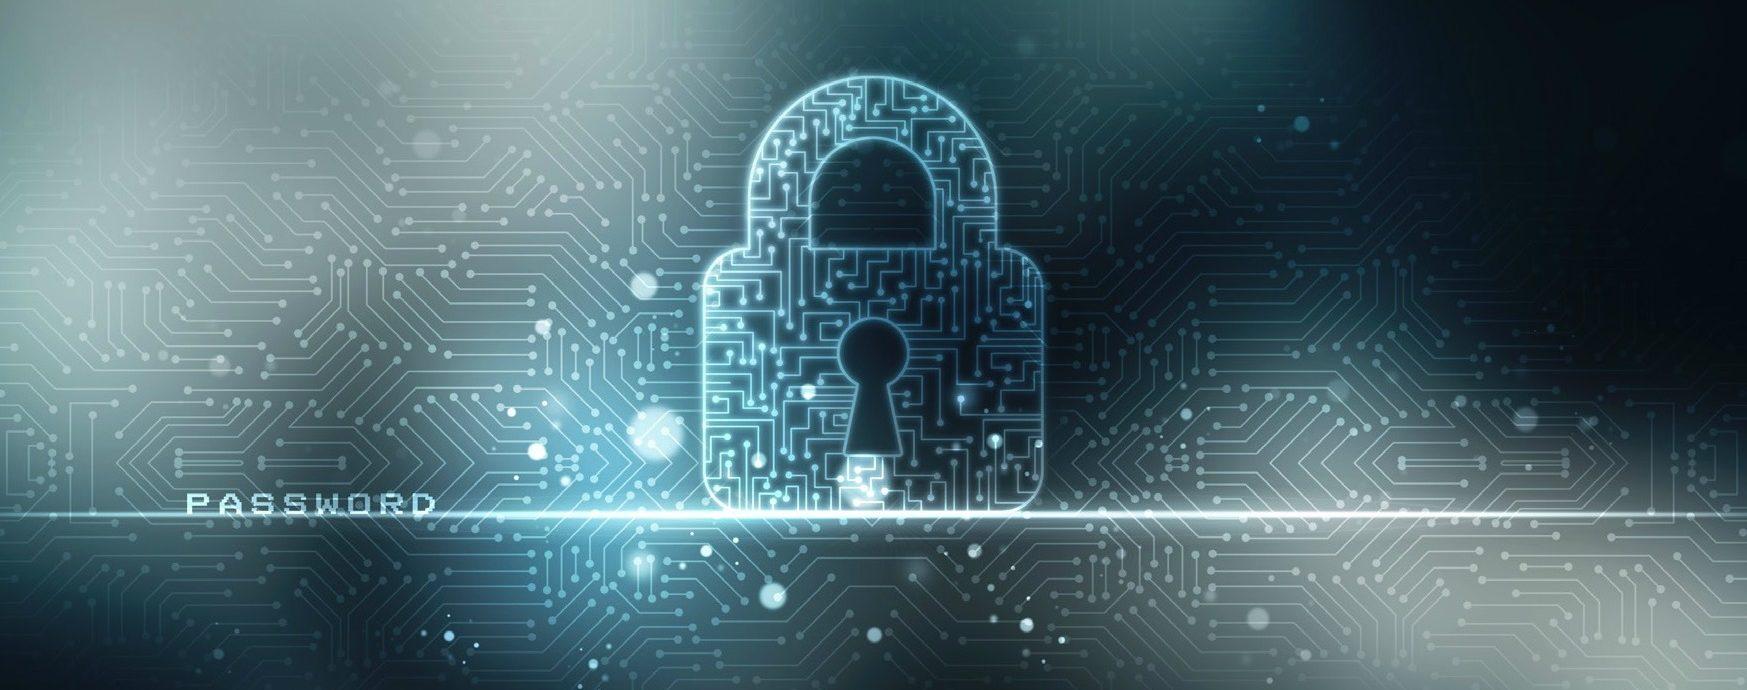 Online Security Measures CyberAttackers CyberSecurity Hack CyberThreat Data Digital - Stock